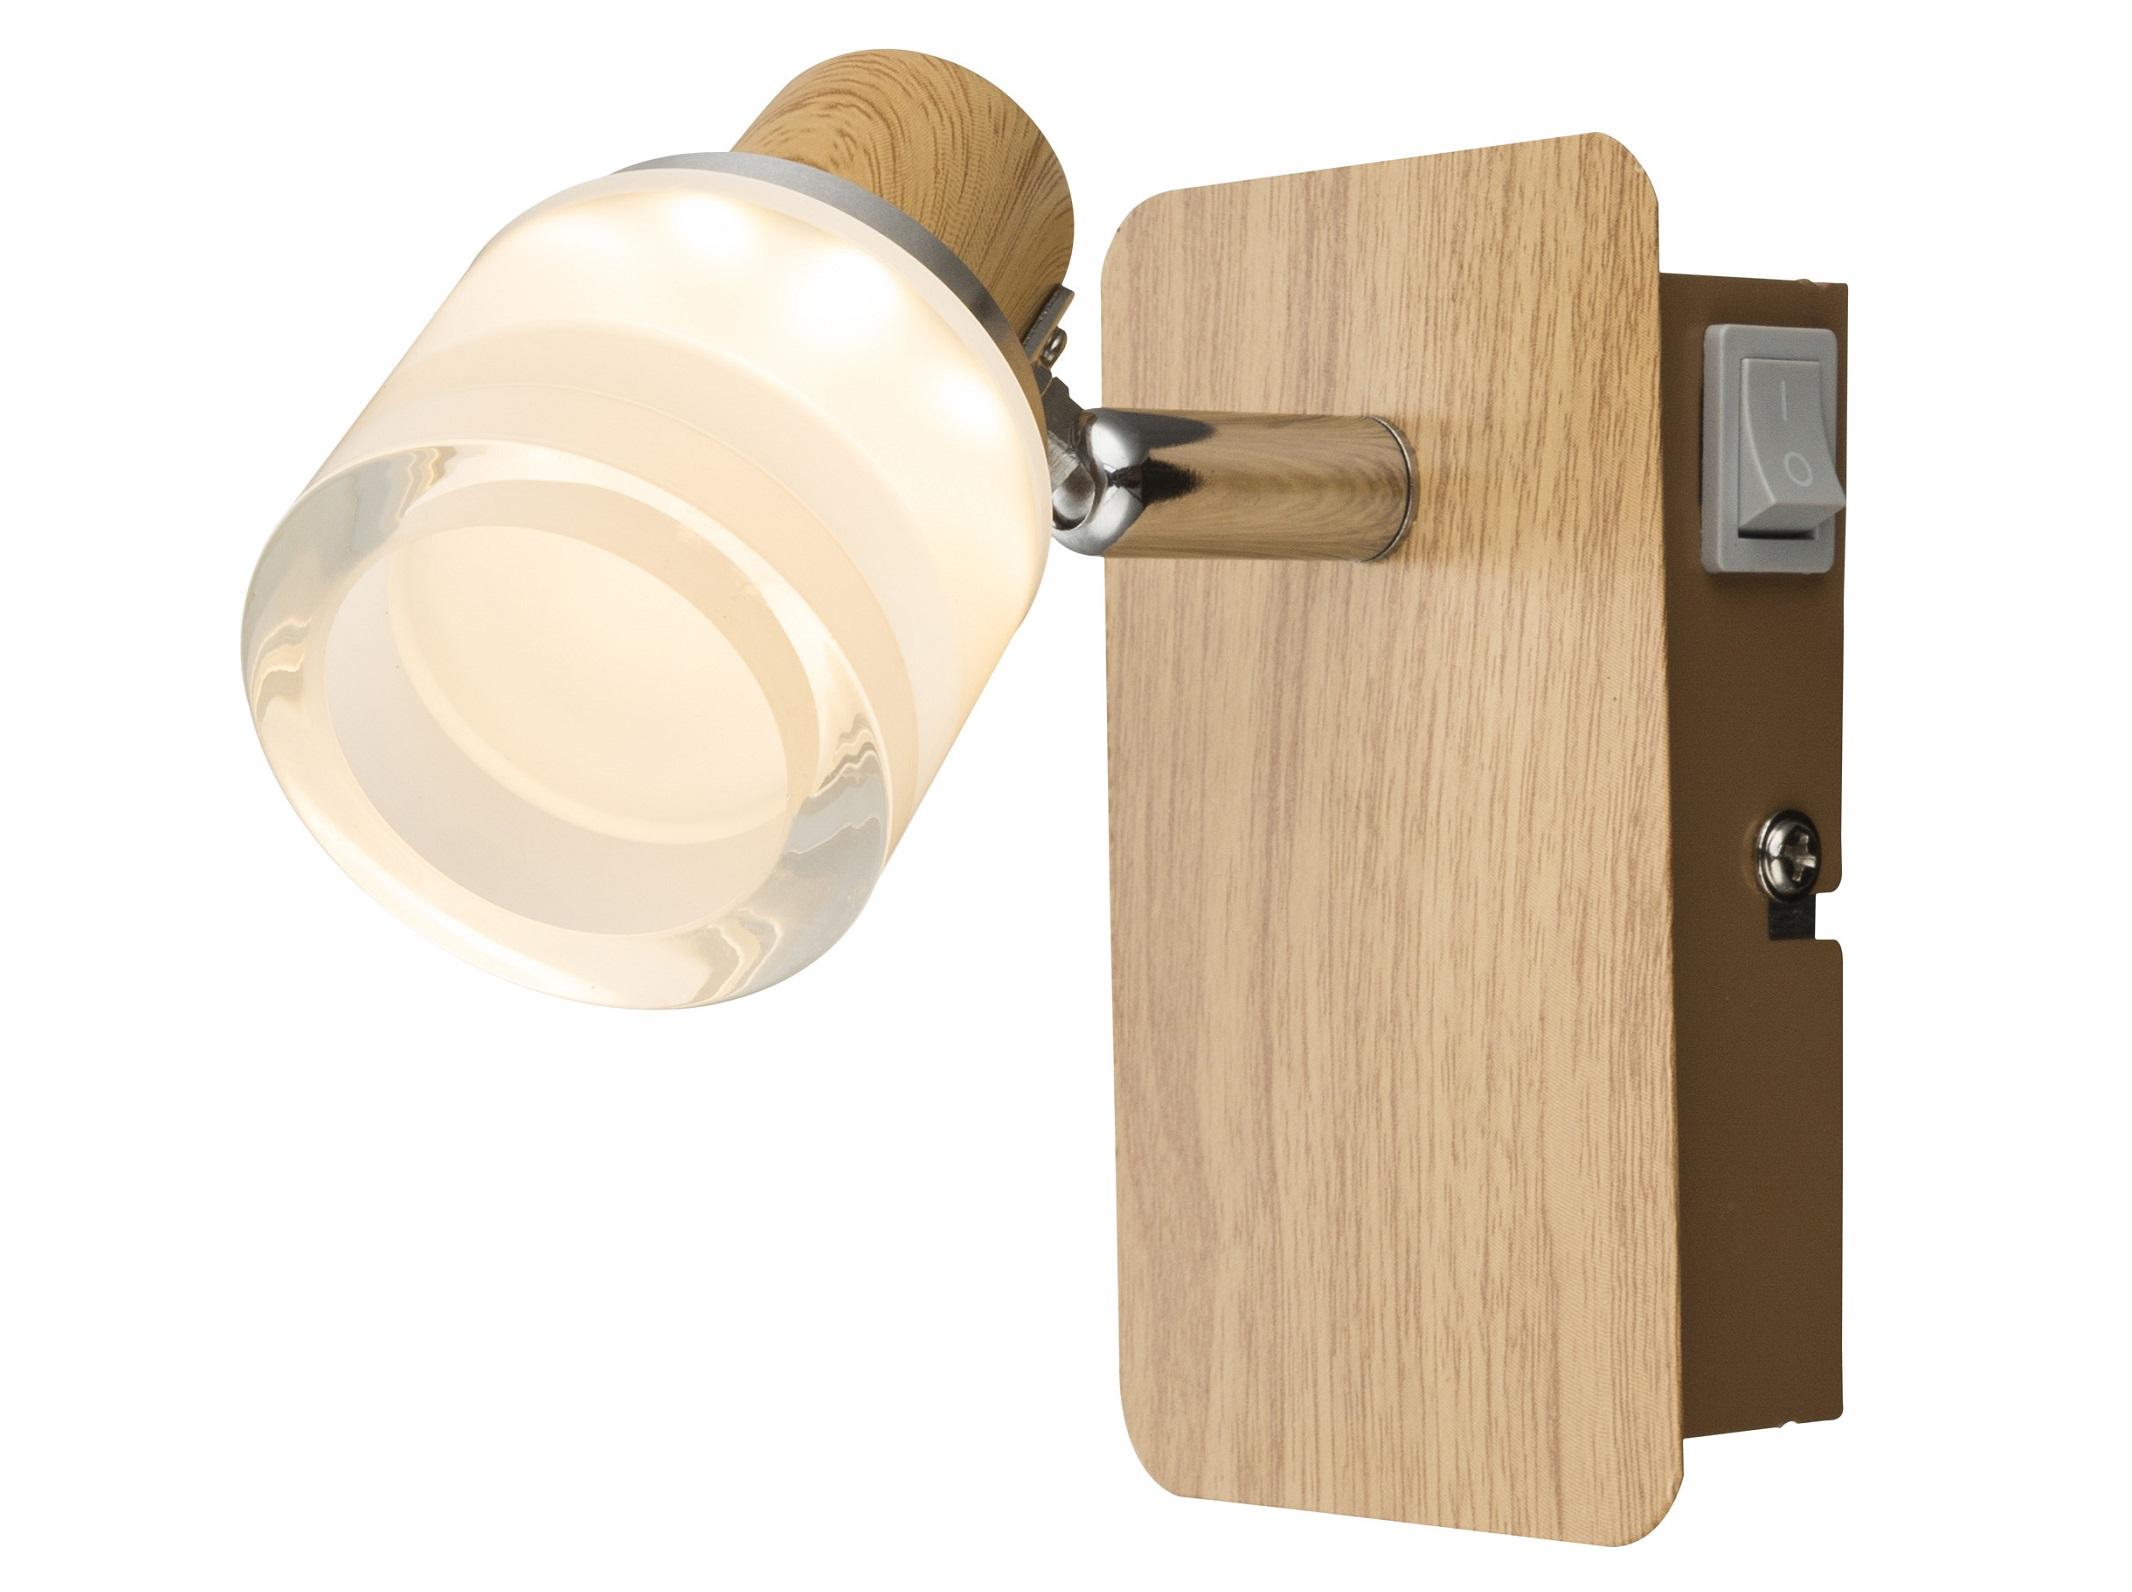 СпотСпоты<br><br>Вид цоколя: LED<br>Мощность:  5W <br>Количество ламп: 1 (в комплекте)<br>